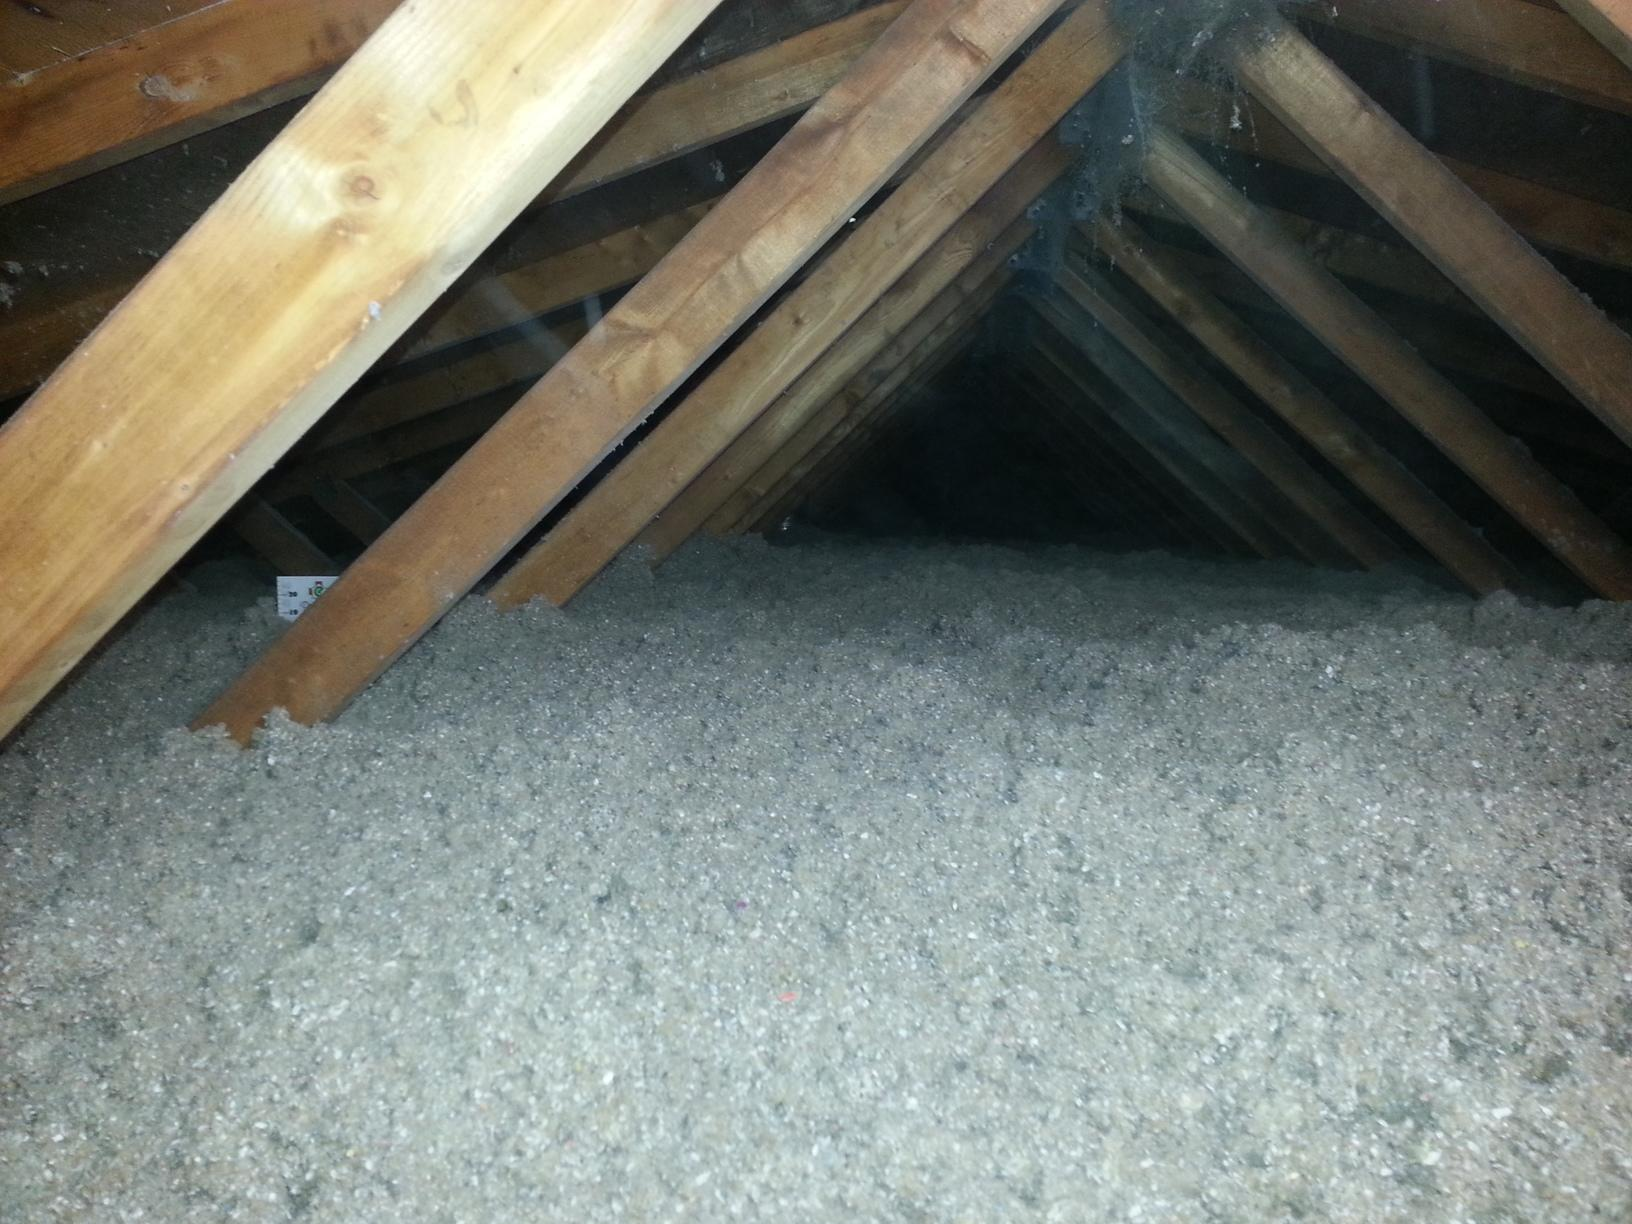 Augusta, Maine Insulation Job - After Photo